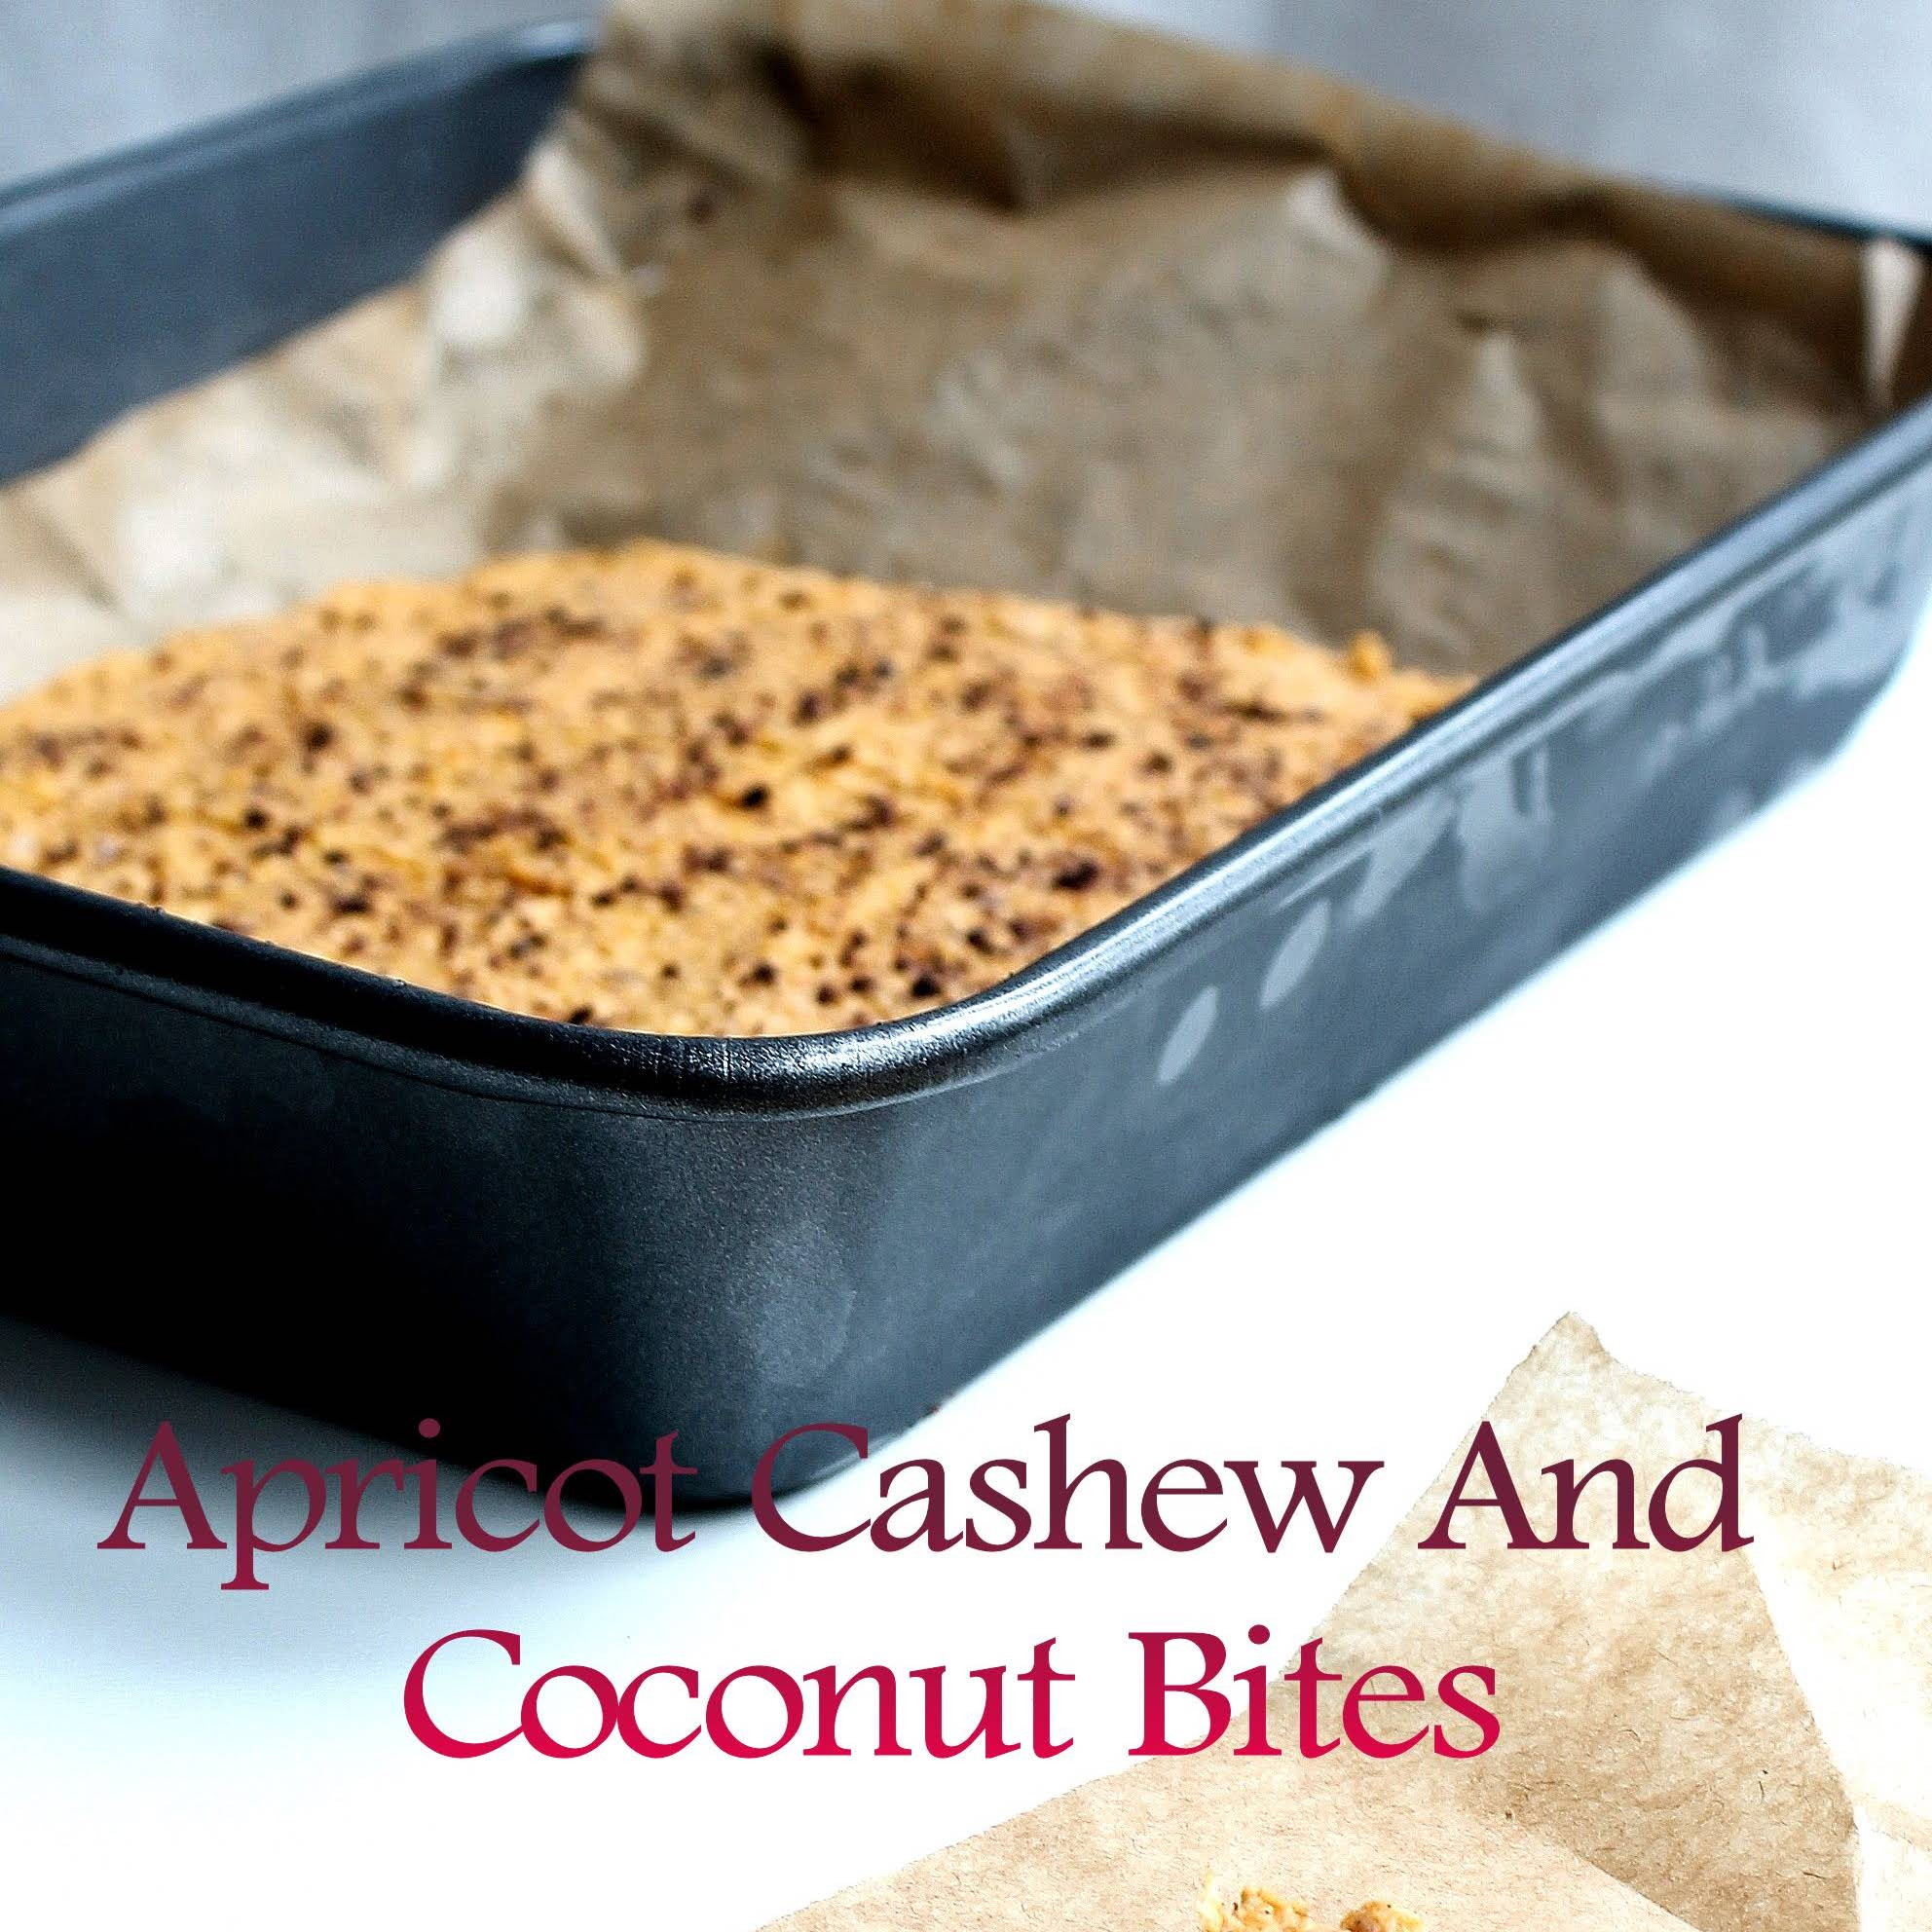 Apricot Cashew And Coconut Bites Diabetes Friendly